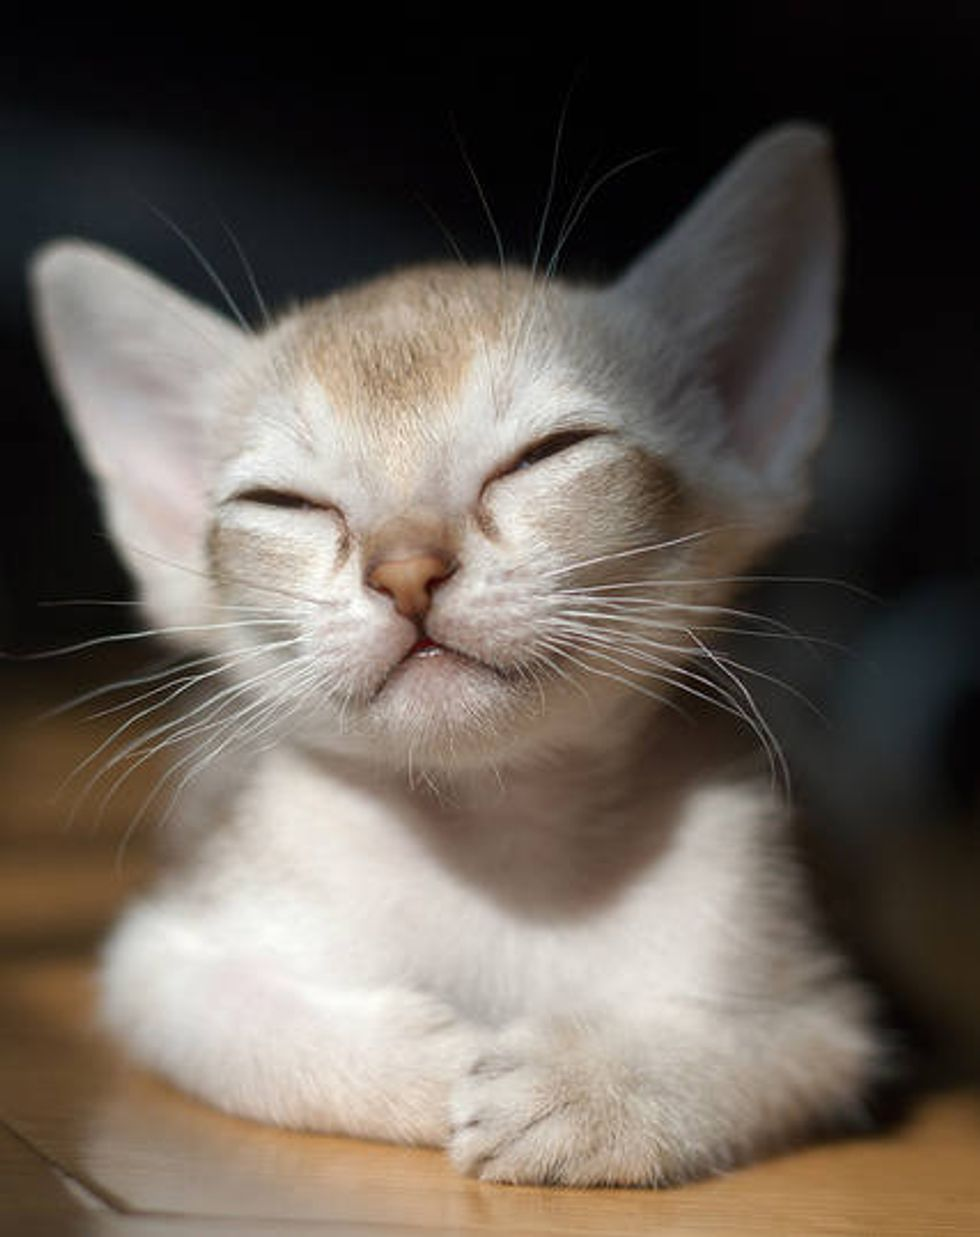 Big-eared Kitty is Pleased